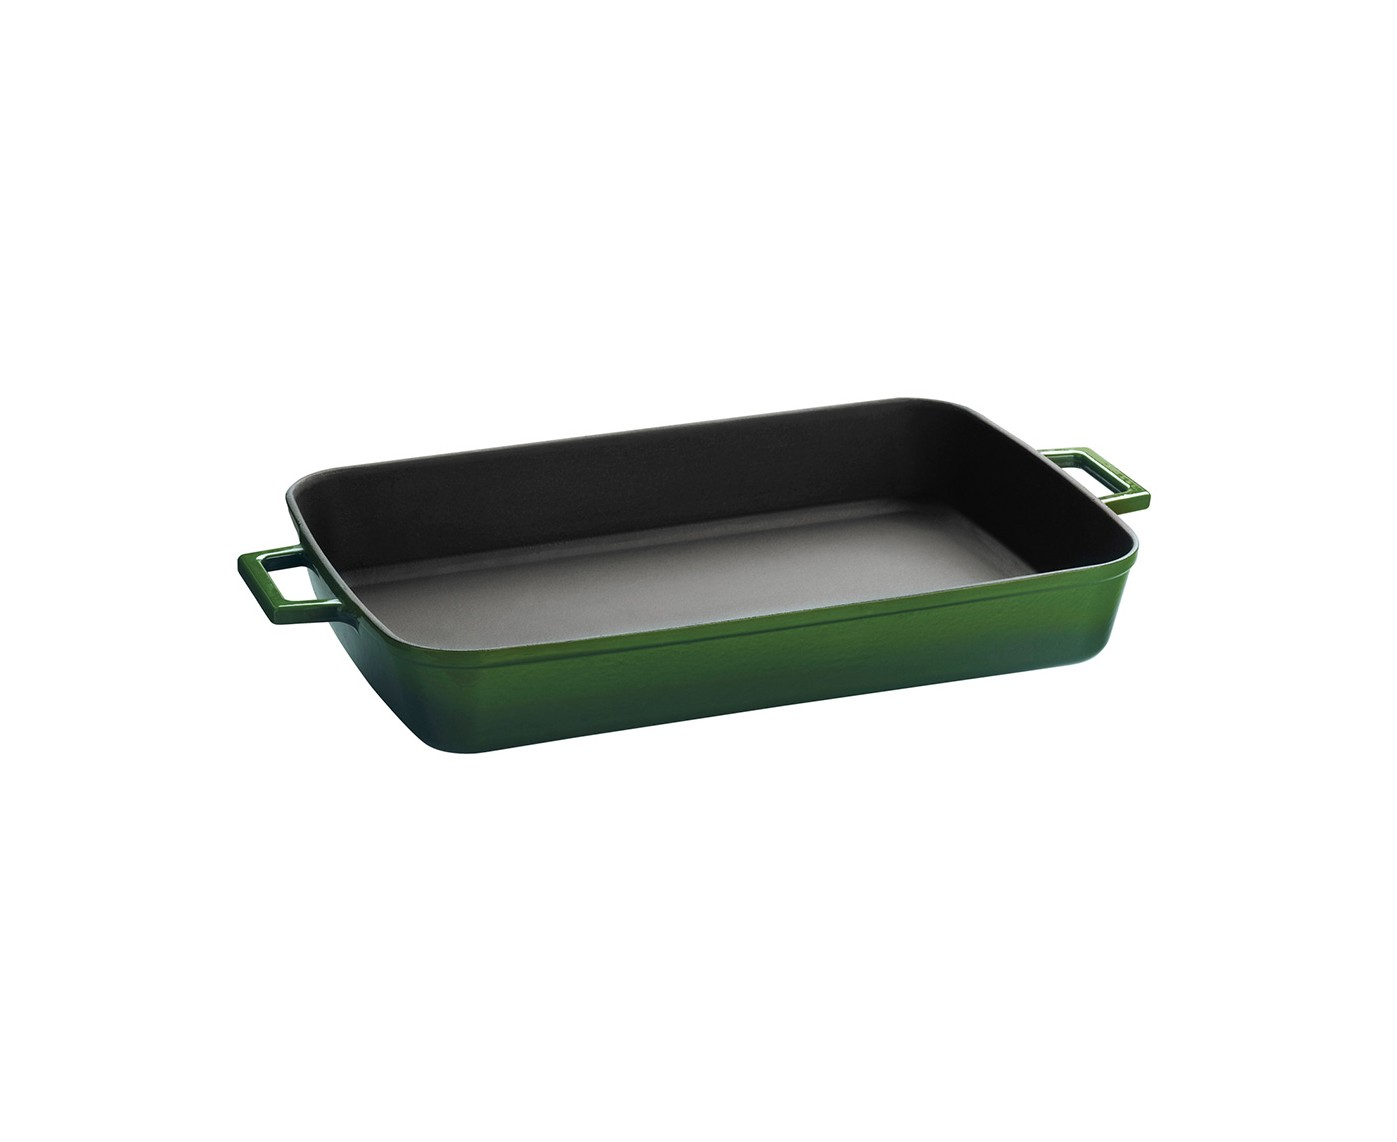 Litinový pekáč 22x30cm - zelený